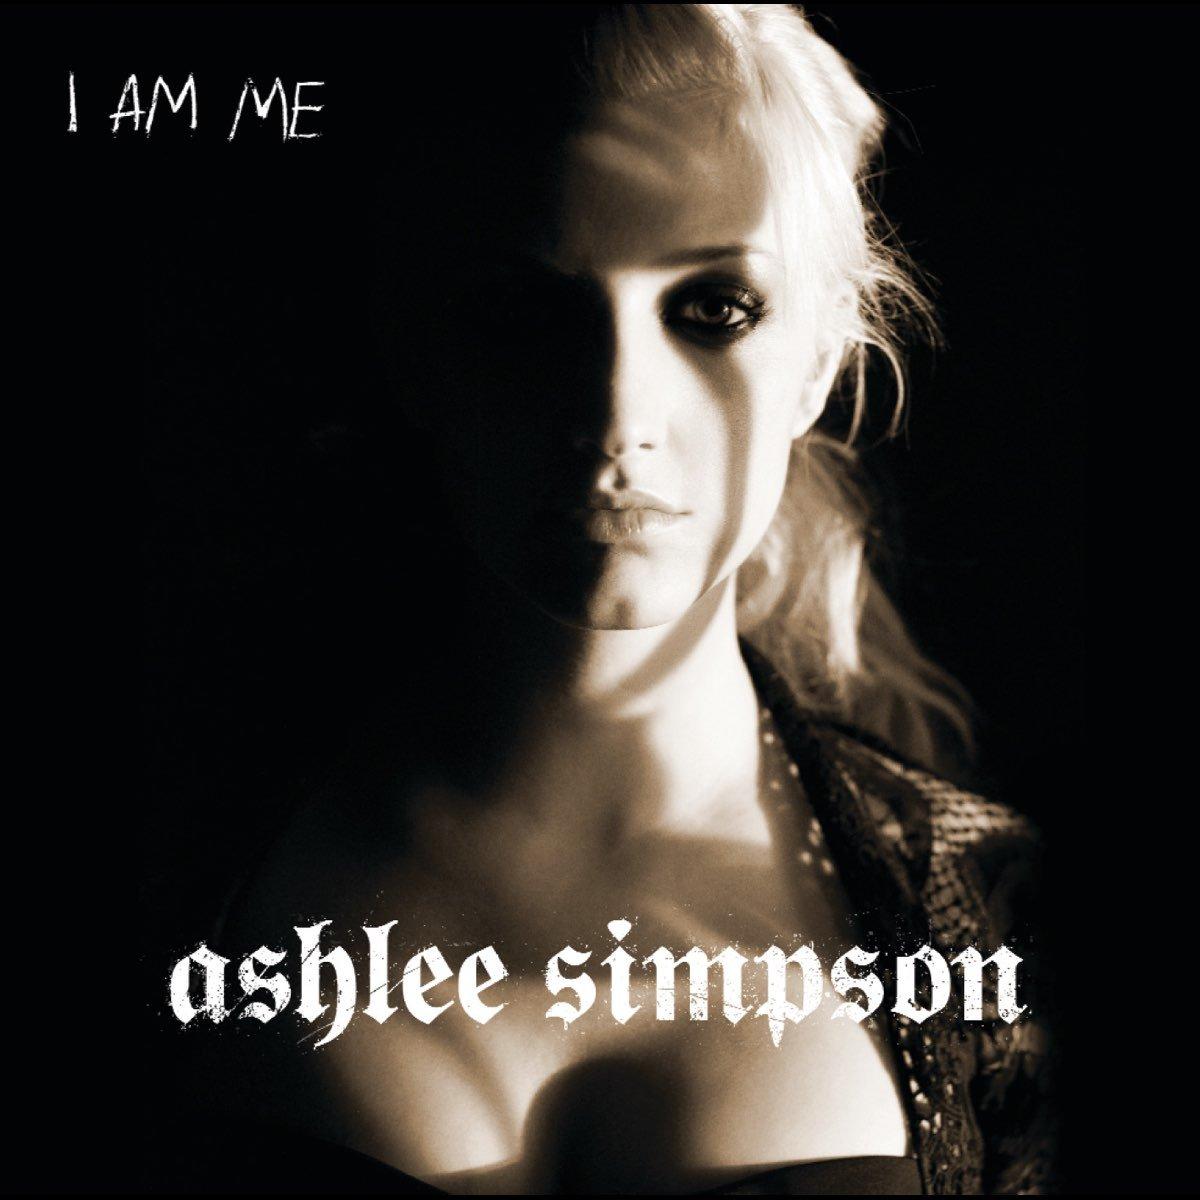 Ashlee Simpson, I Am Me